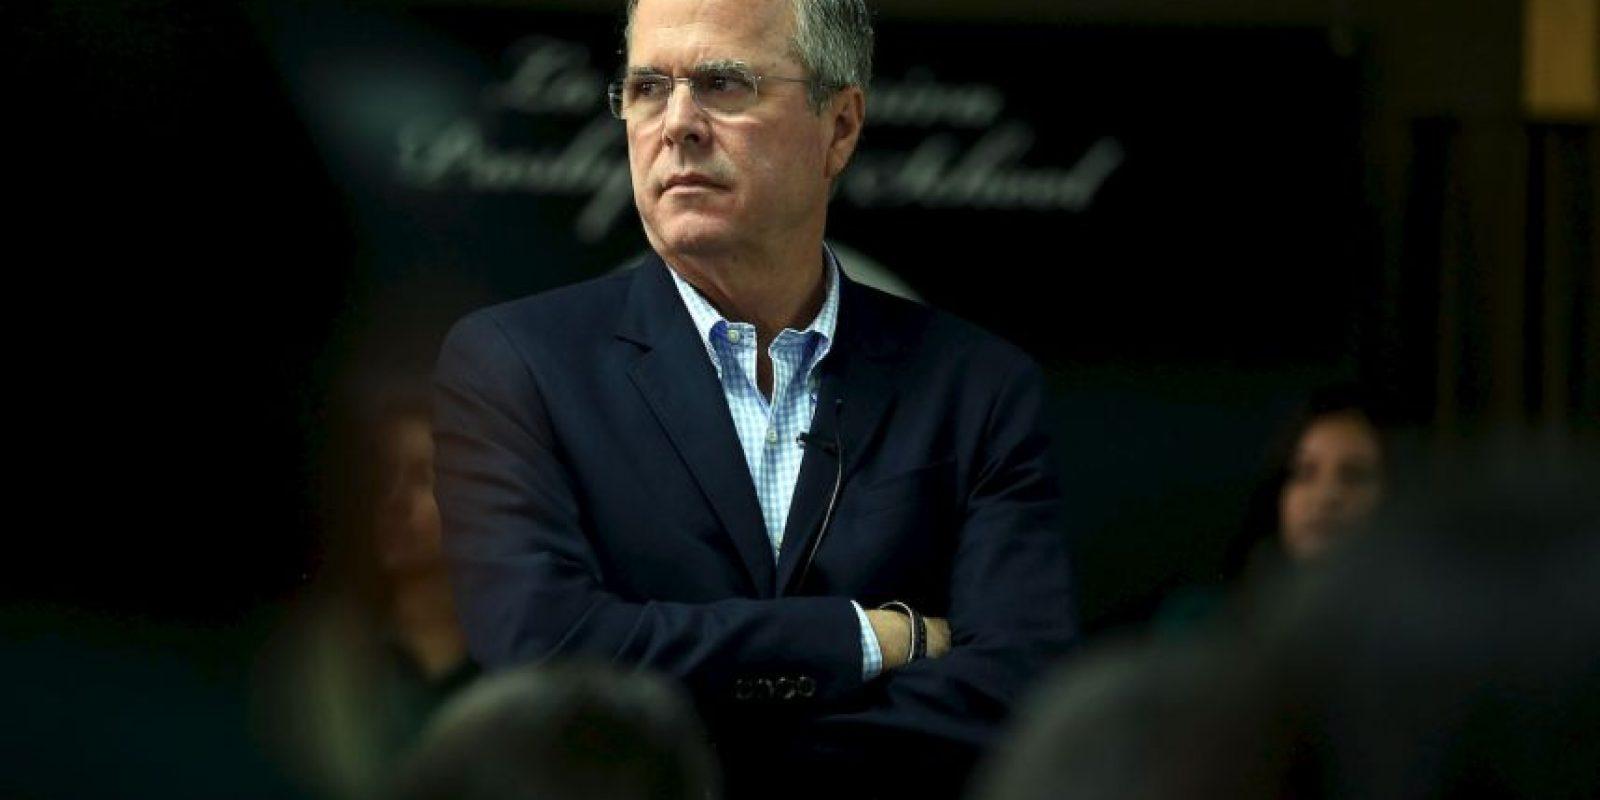 Procrearon tres hijos: George P. Bush, Noelle Bush, John Ellis Bush, Jr. Foto:Getty Images